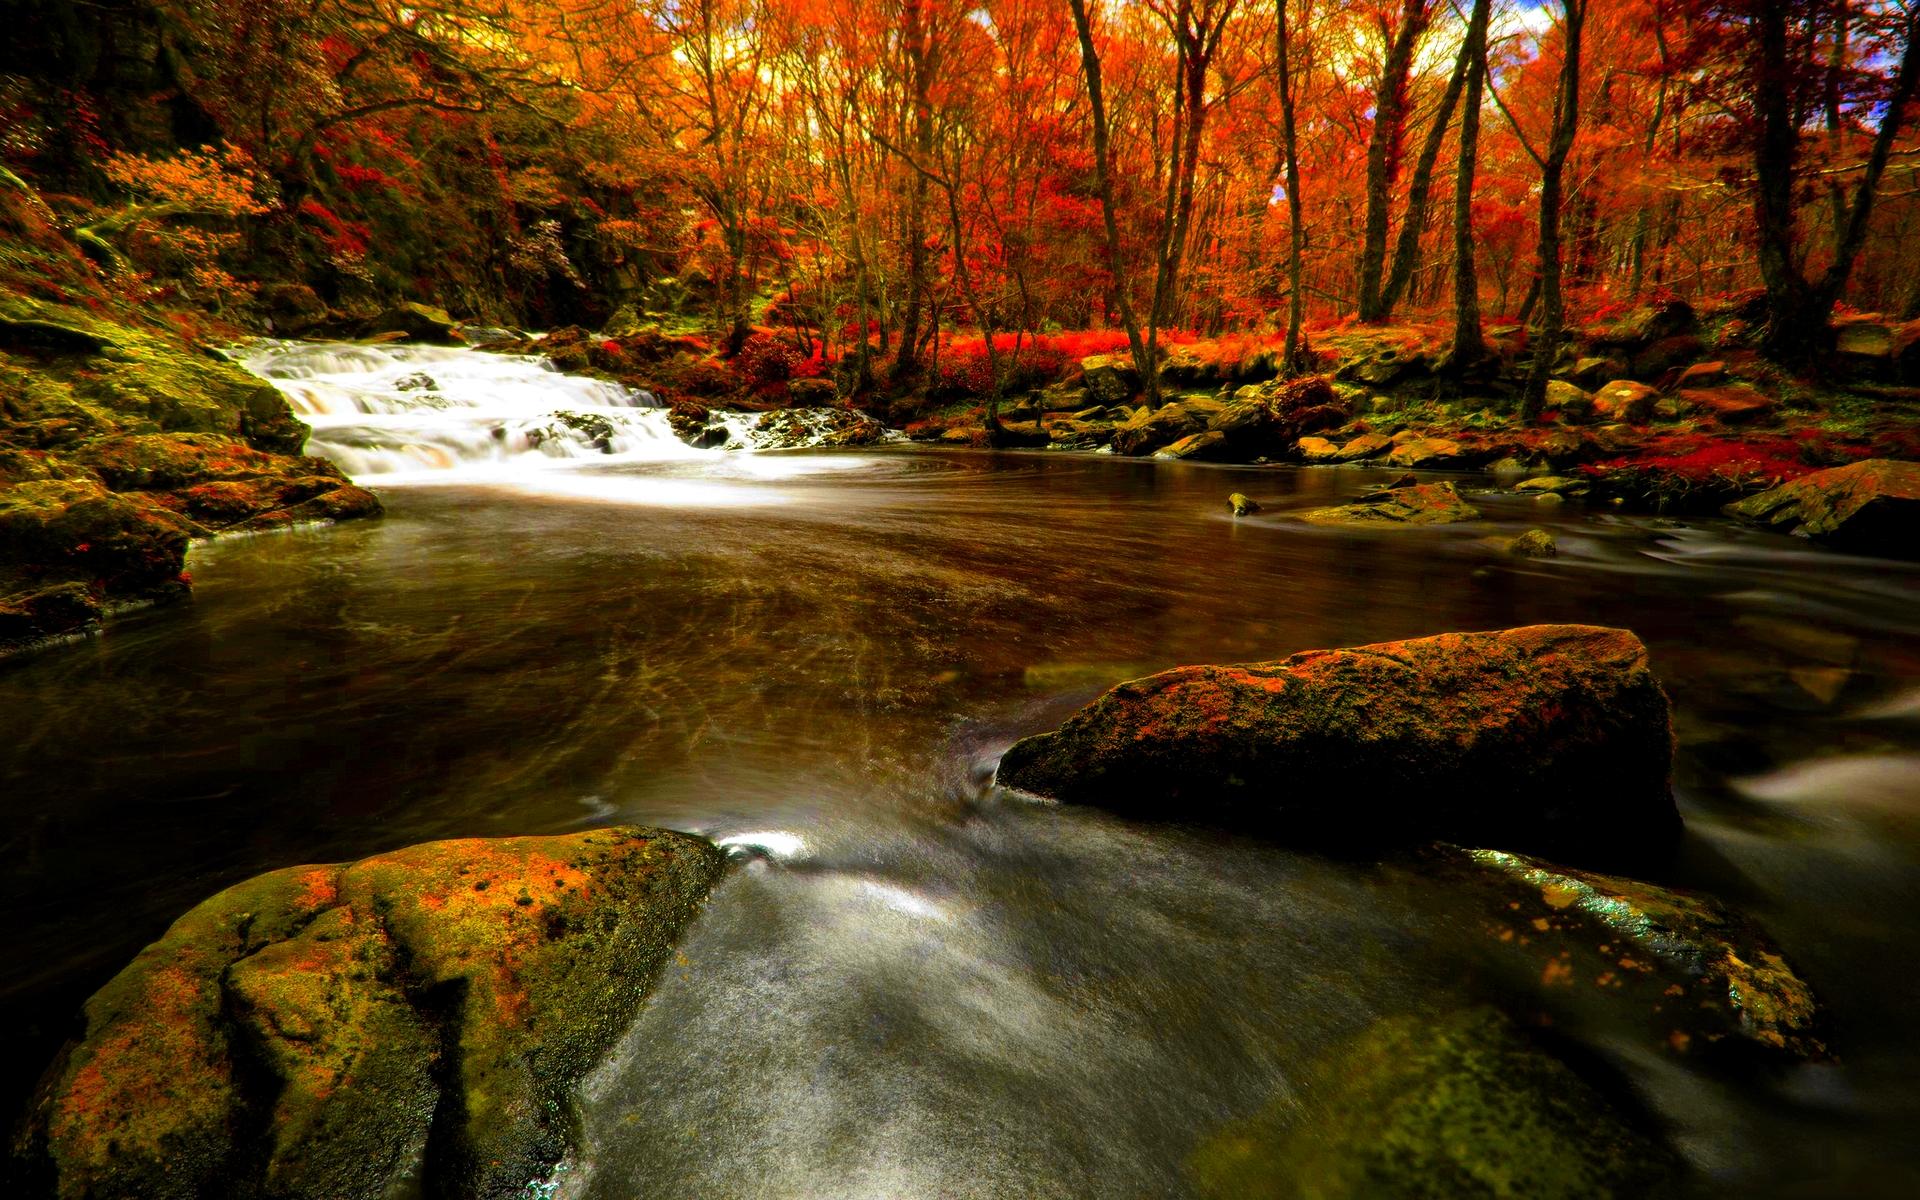 Autumn River HD Wallpaper